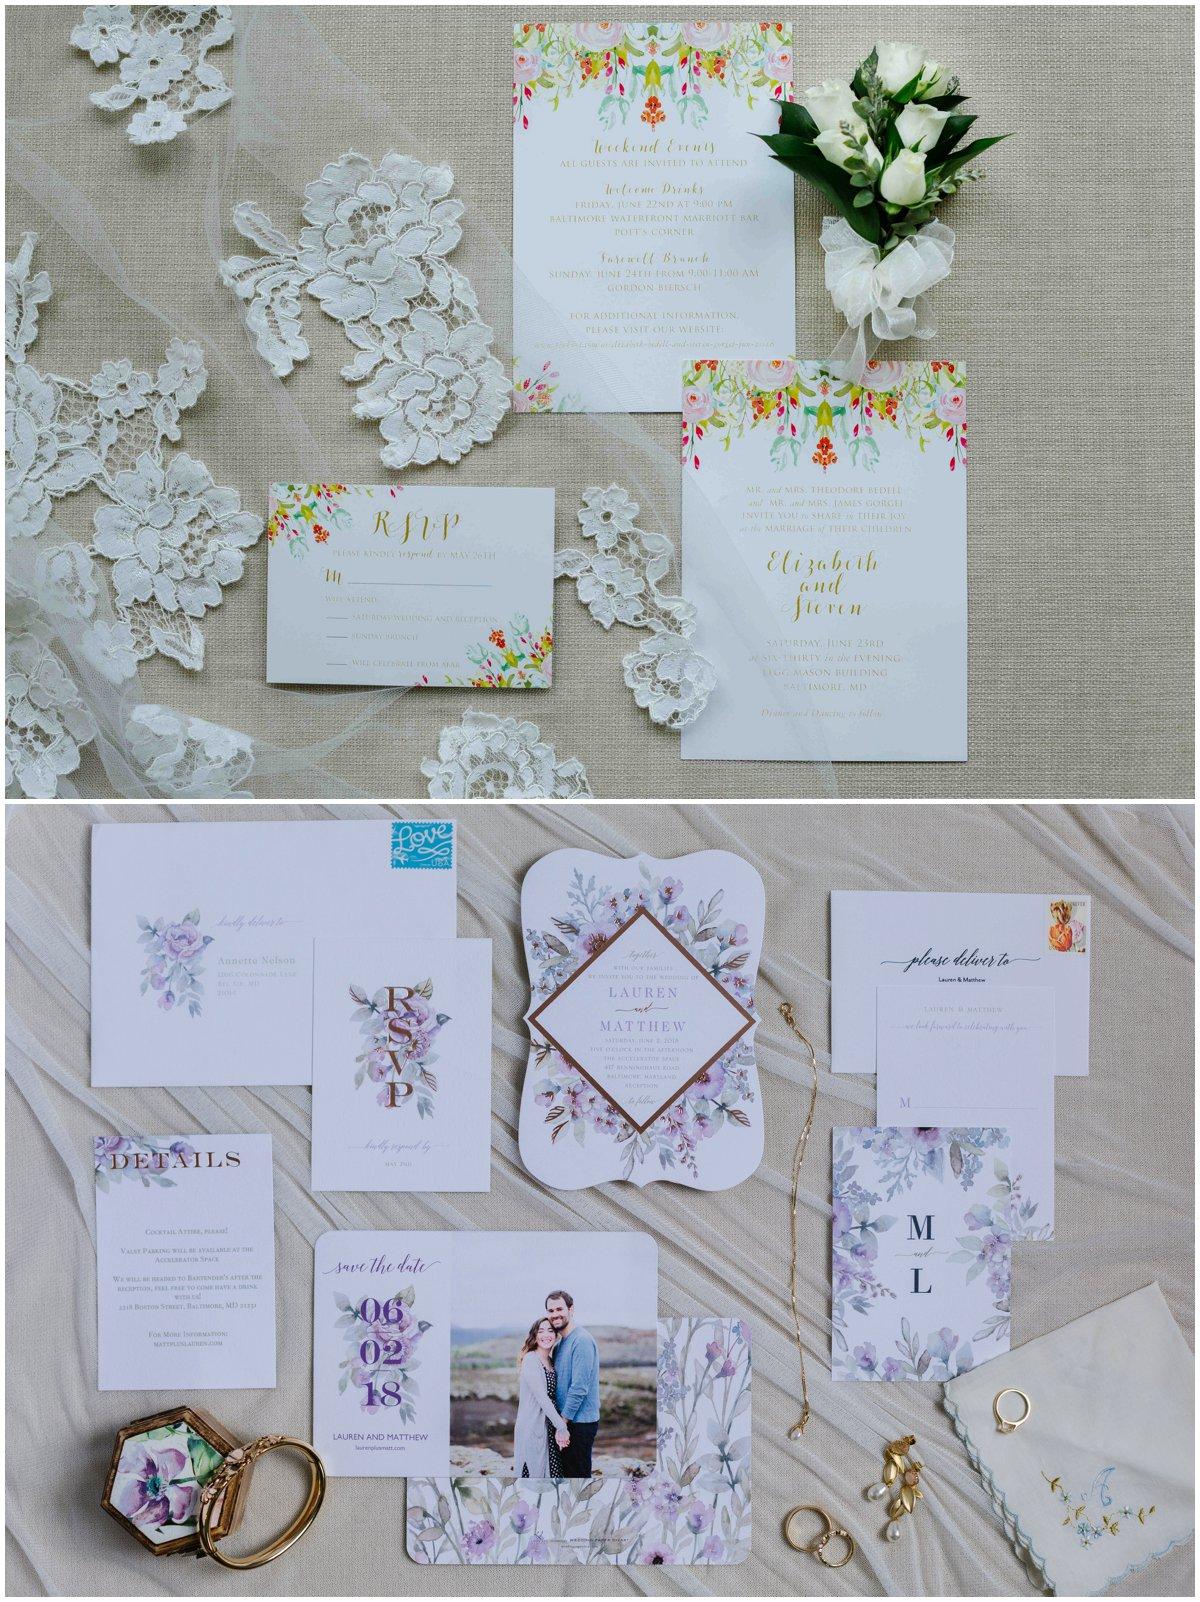 urban-row-photography-rosewood-farms-romantic-floral-wedding-invitation_0012.jpg